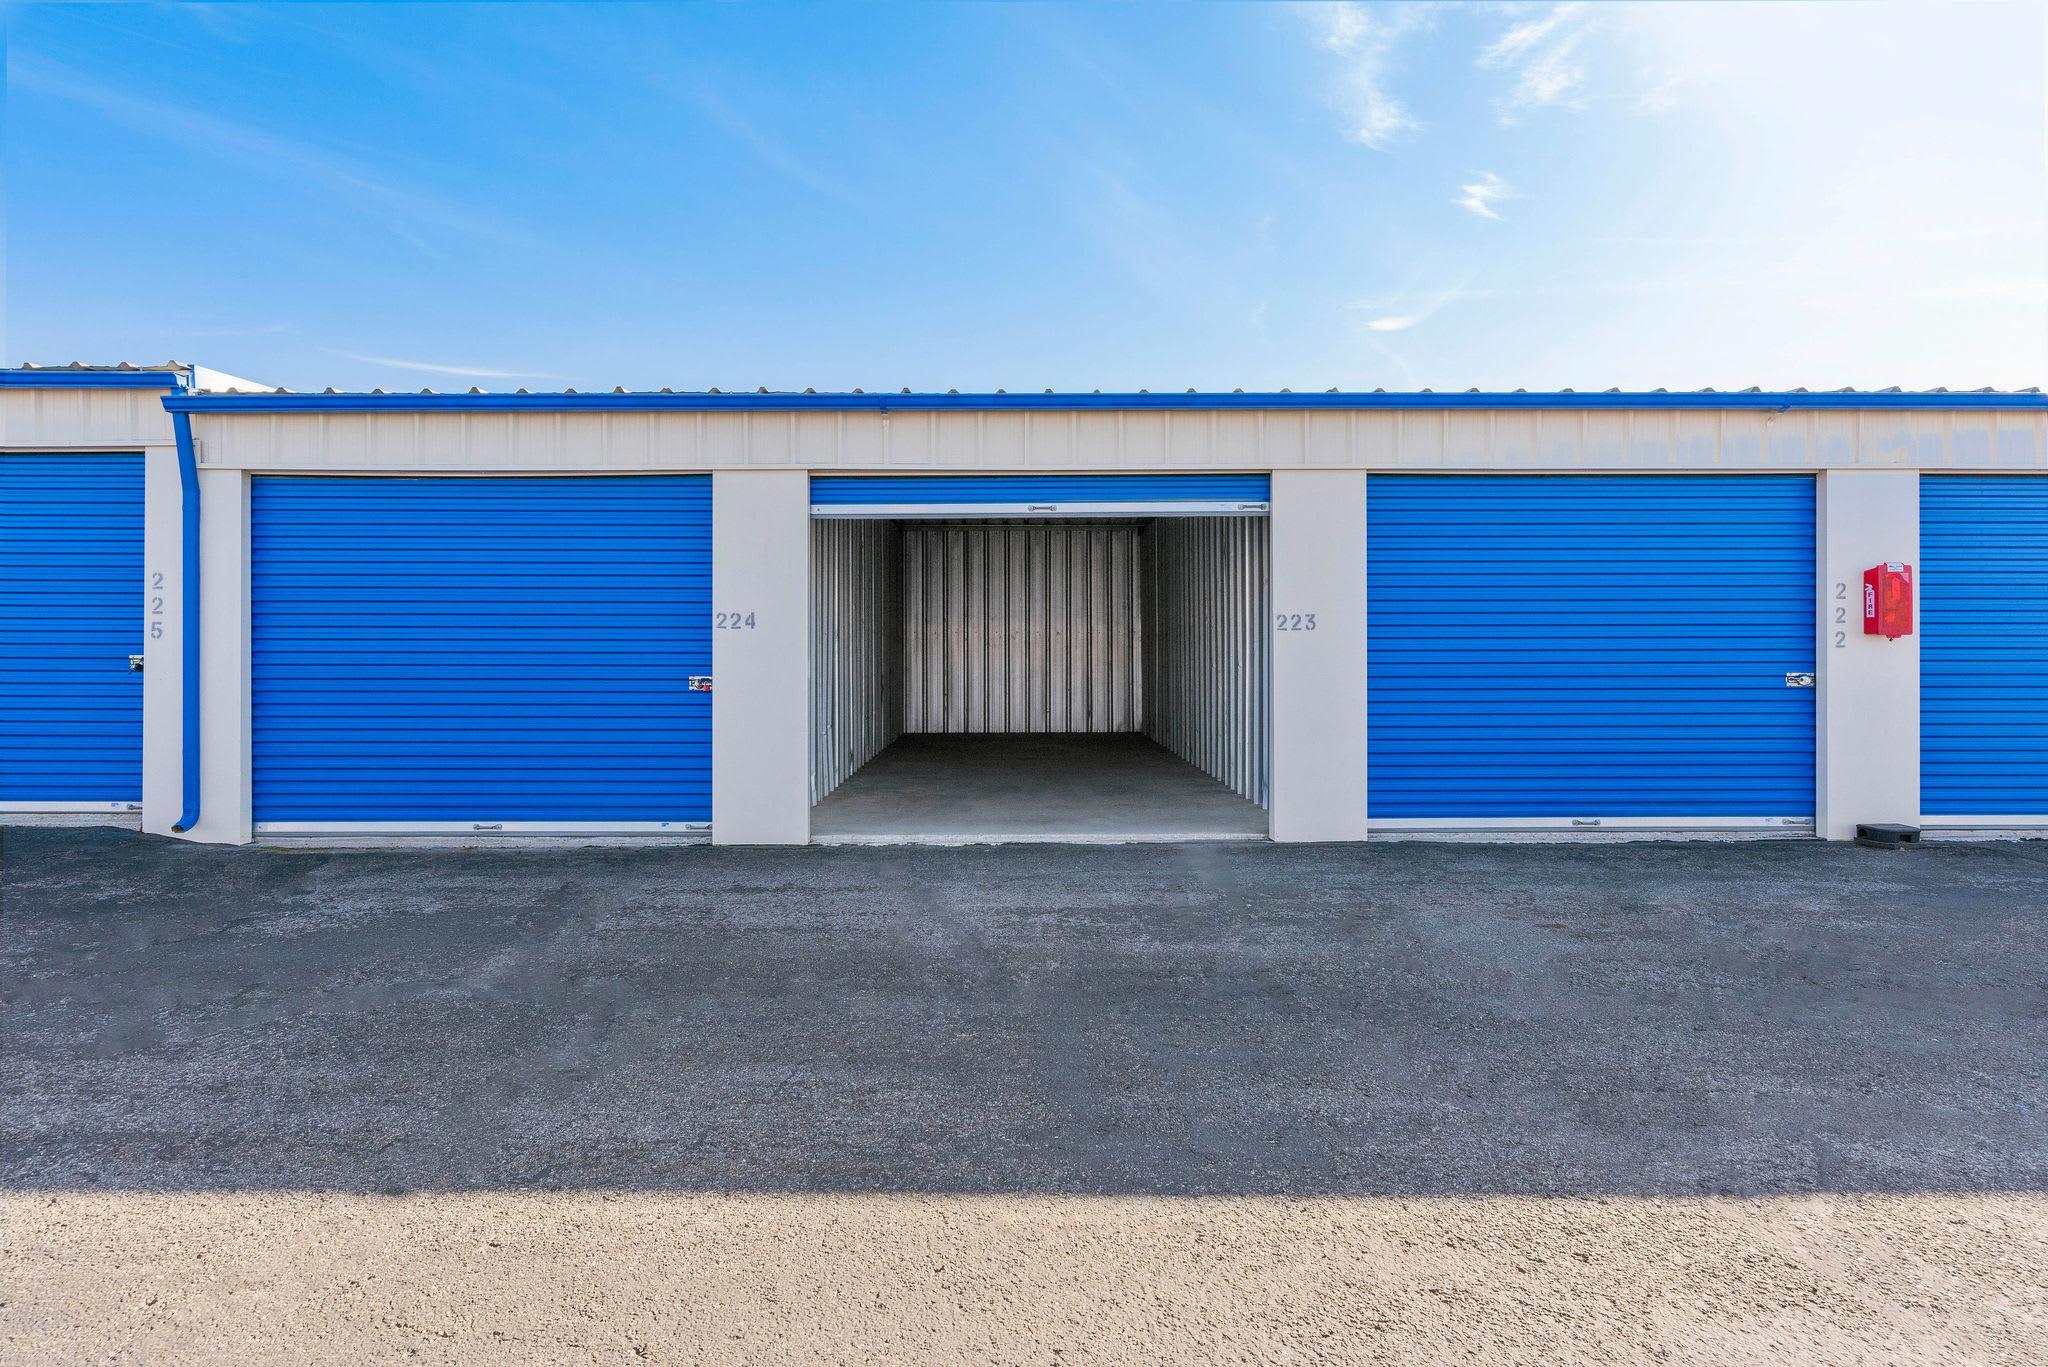 Drive up storage open unit at Stor'em Self Storage in Orem, Utah